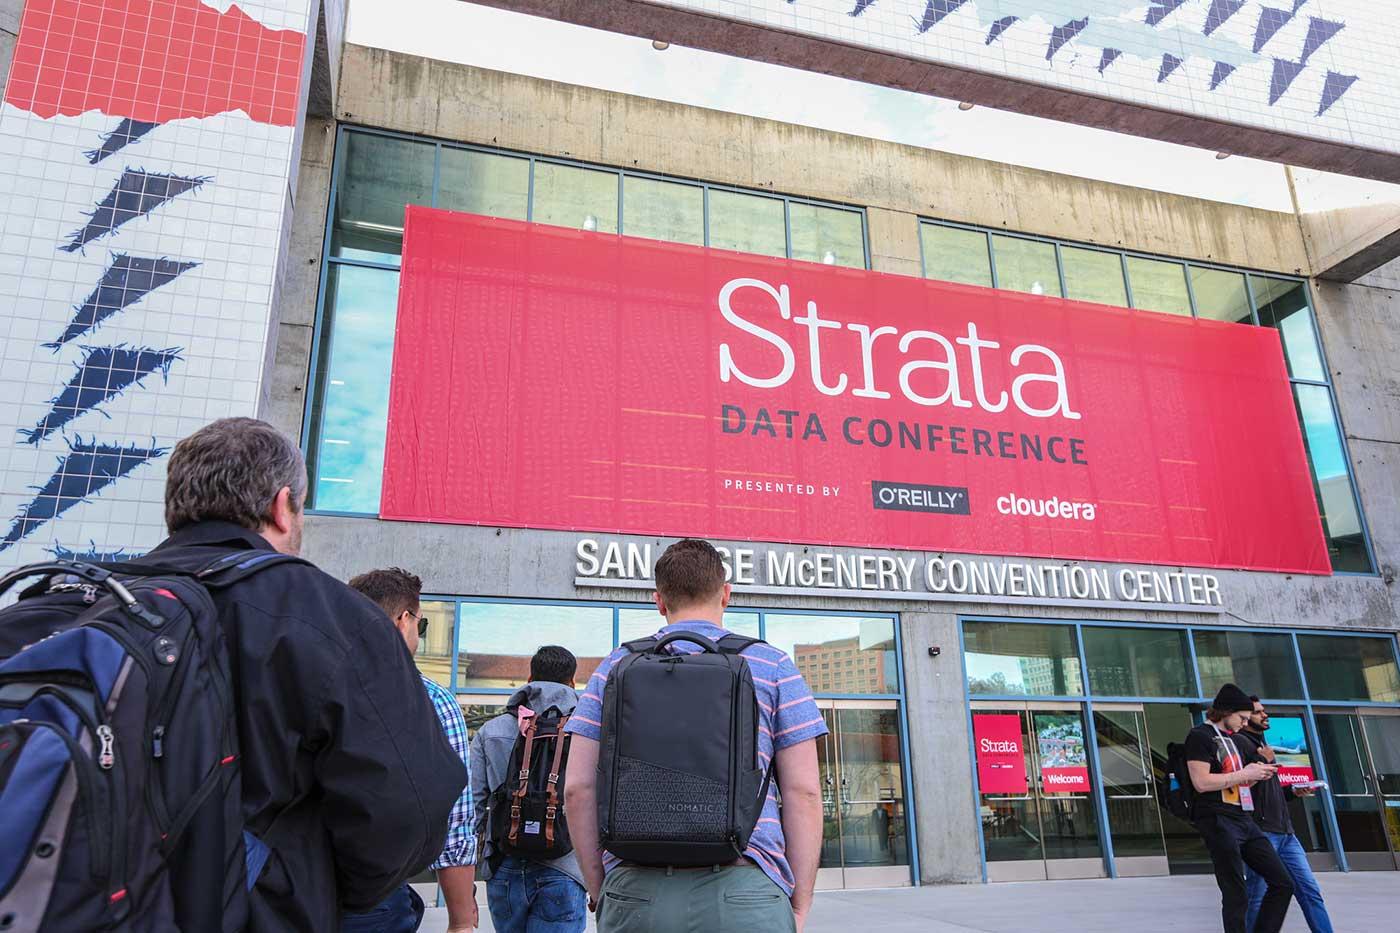 Strata Data Conference 2018 in San Jose